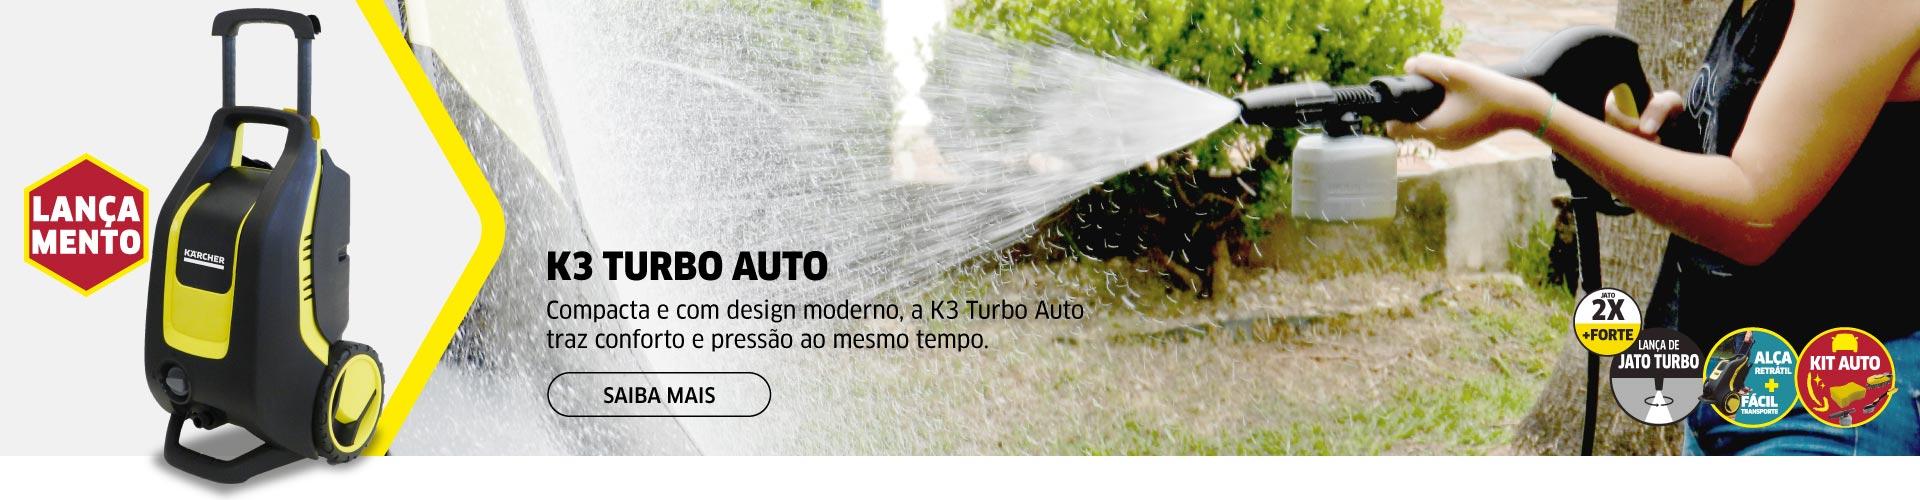 K3 Turbo Auto